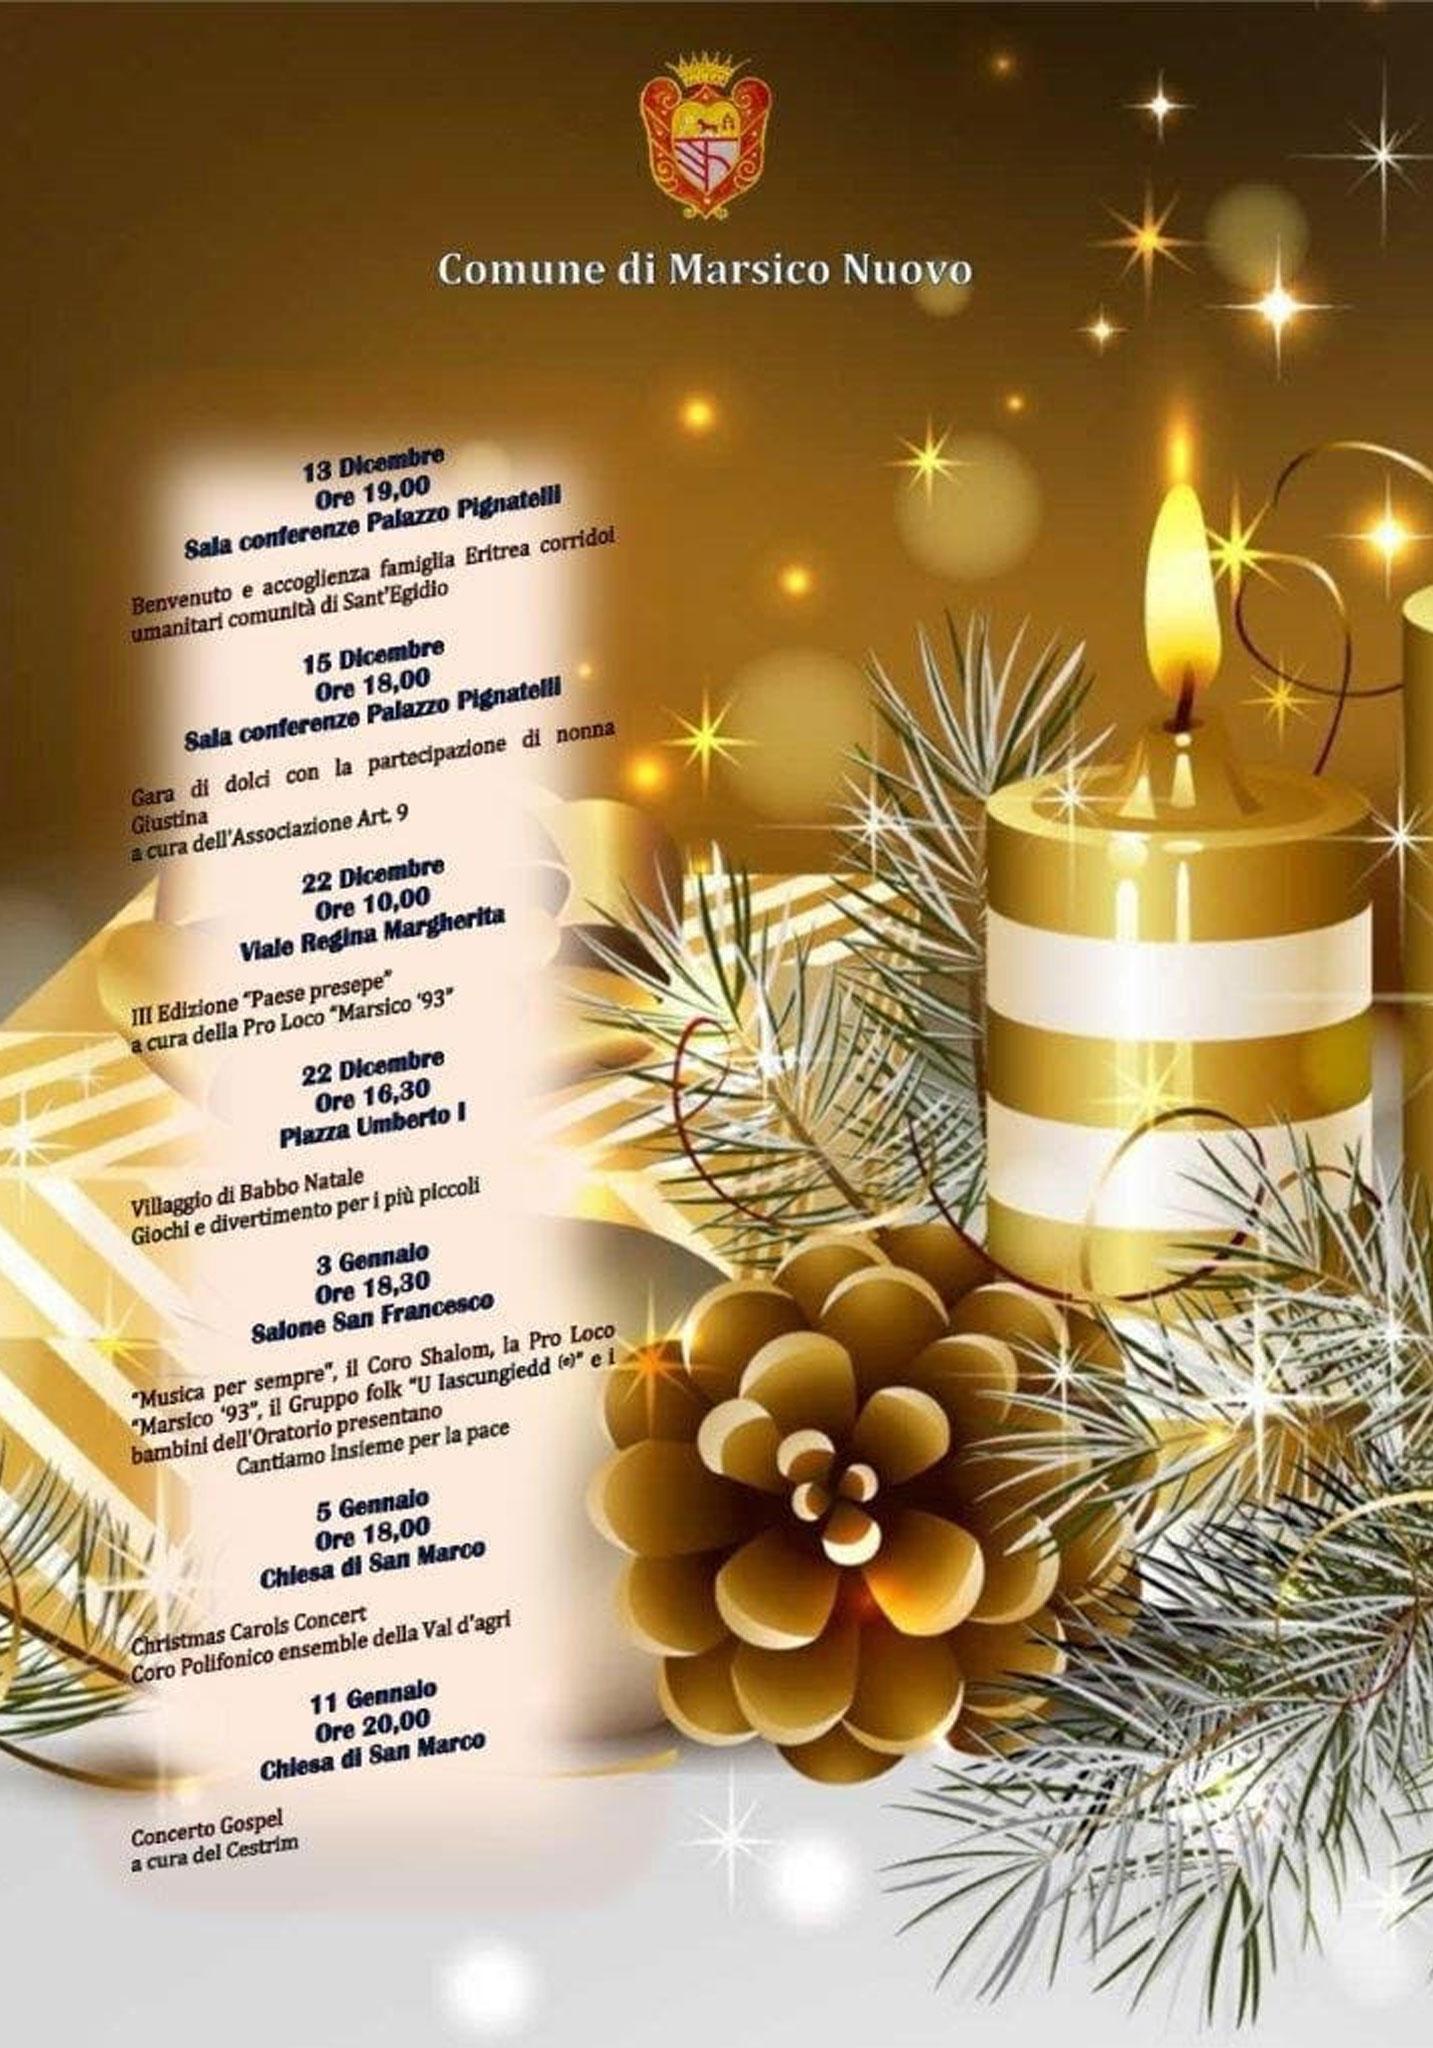 https://www.cuorebasilicata.it/wp-content/uploads/2019/12/marsico_nuovo.jpg